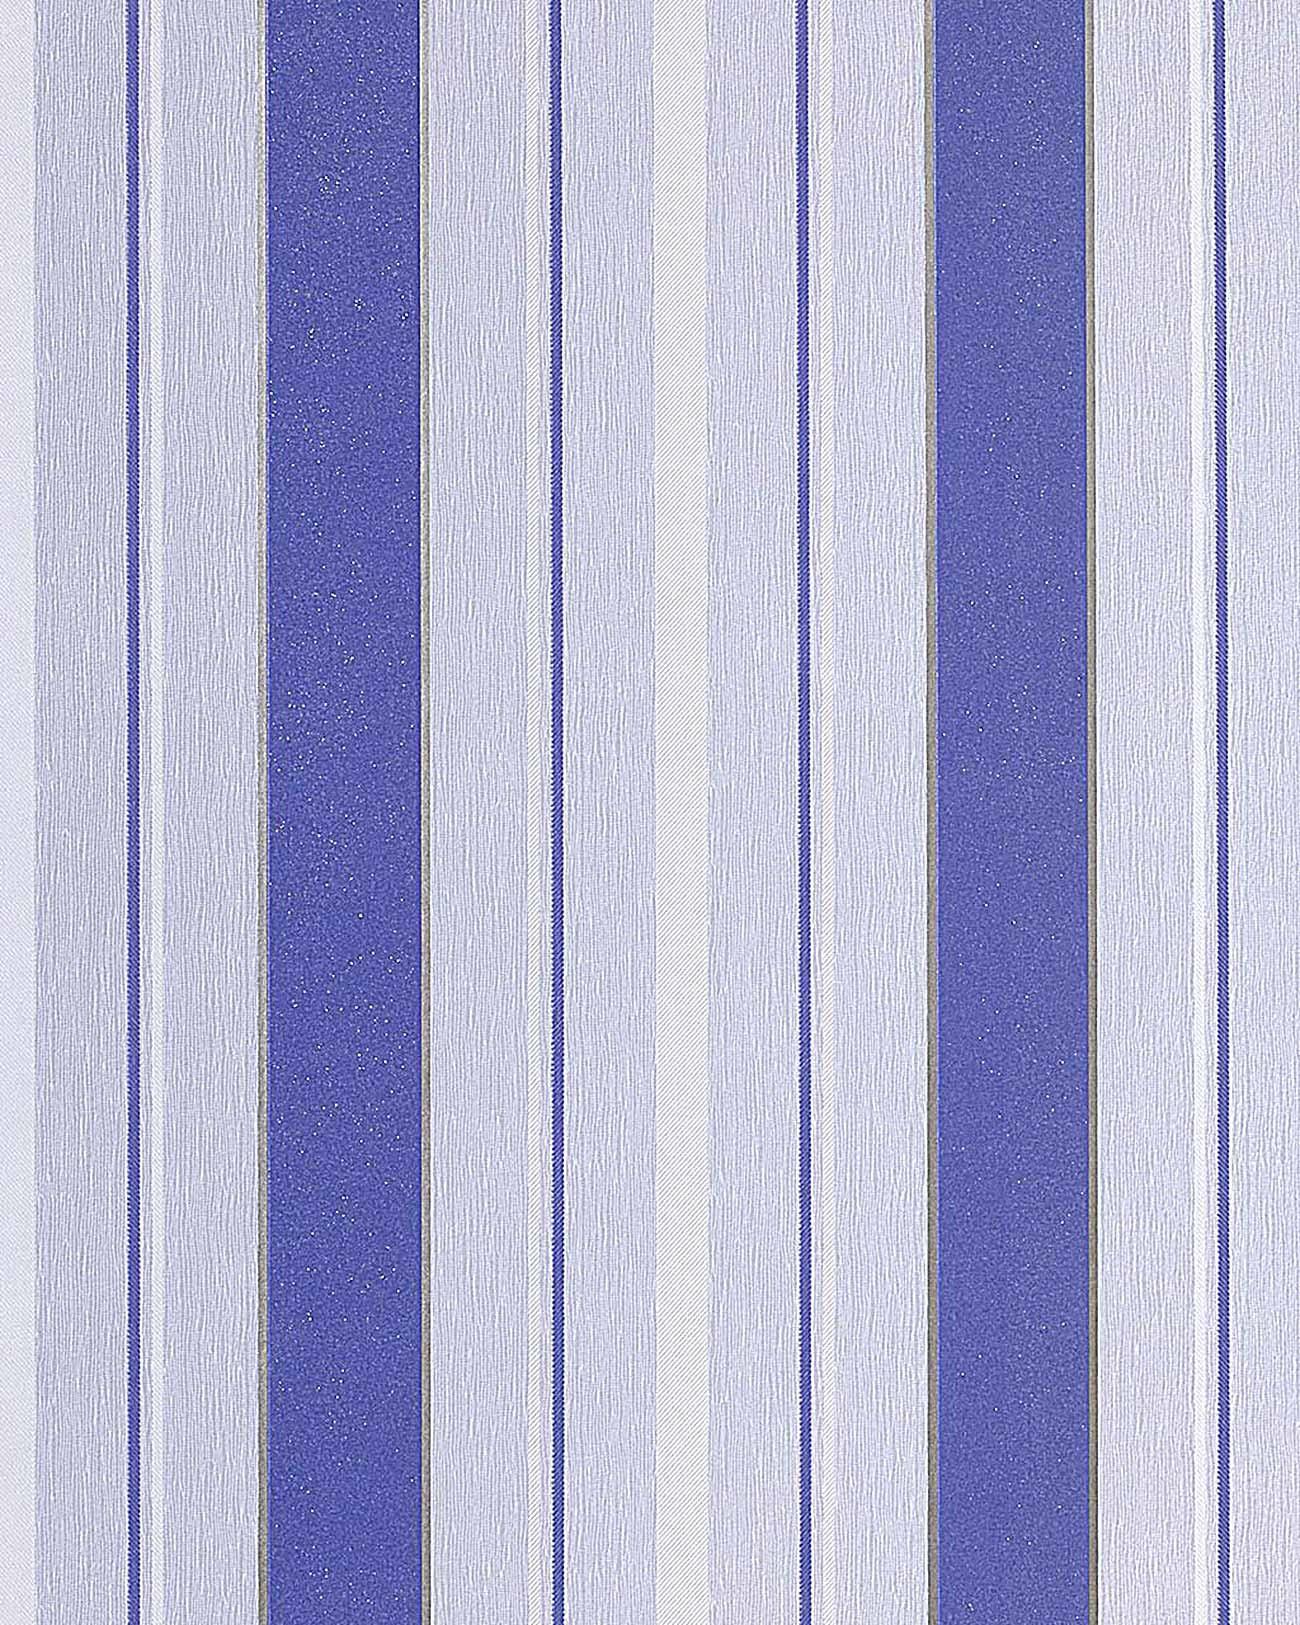 Papel pintado texturado dise o rayas gruesas edem 069 22 - Papel pintado blanco y plata ...